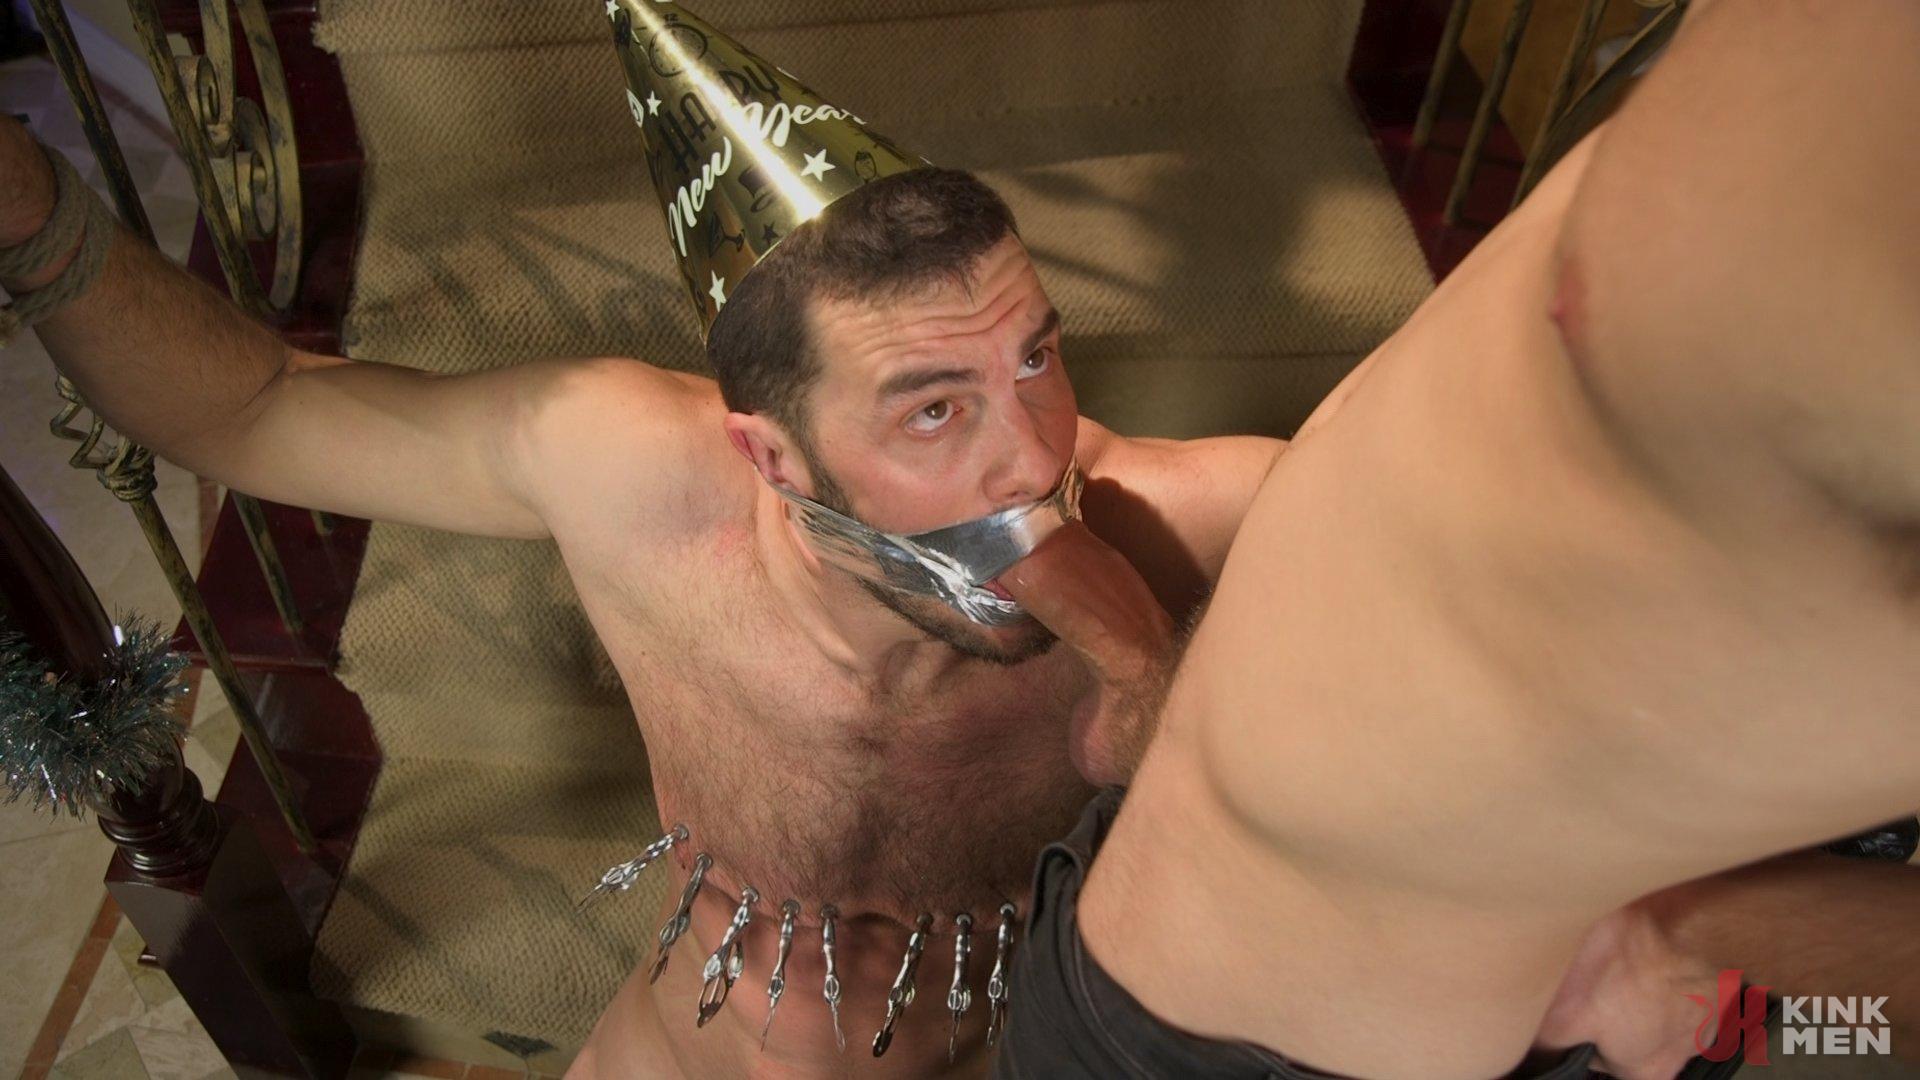 Photo number 16 from Homo Alone Part 2: Pizza Man Michael DelRay Punishes Vander Pulaski shot for Bound Gods on Kink.com. Featuring Michael DelRay and Vander Pulaski in hardcore BDSM & Fetish porn.